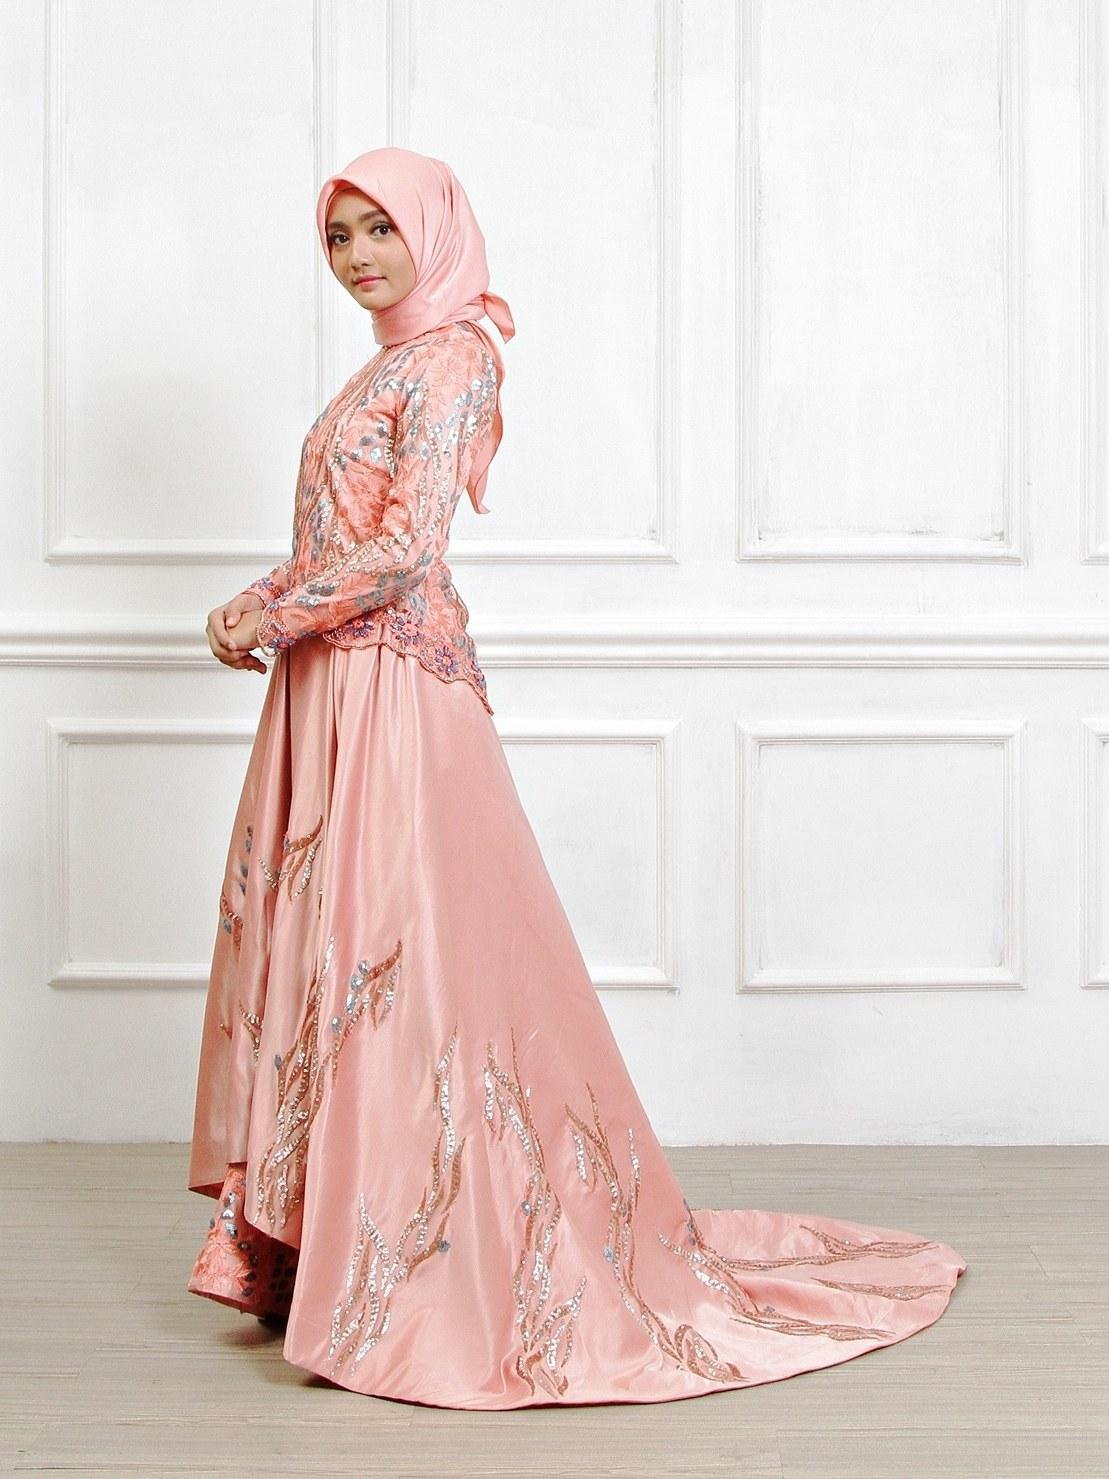 Model Sewa Baju Pengantin Muslimah Modern 9fdy Gaun Pengantin Muslimah Dress Muslim Pungky Rumah Jahit